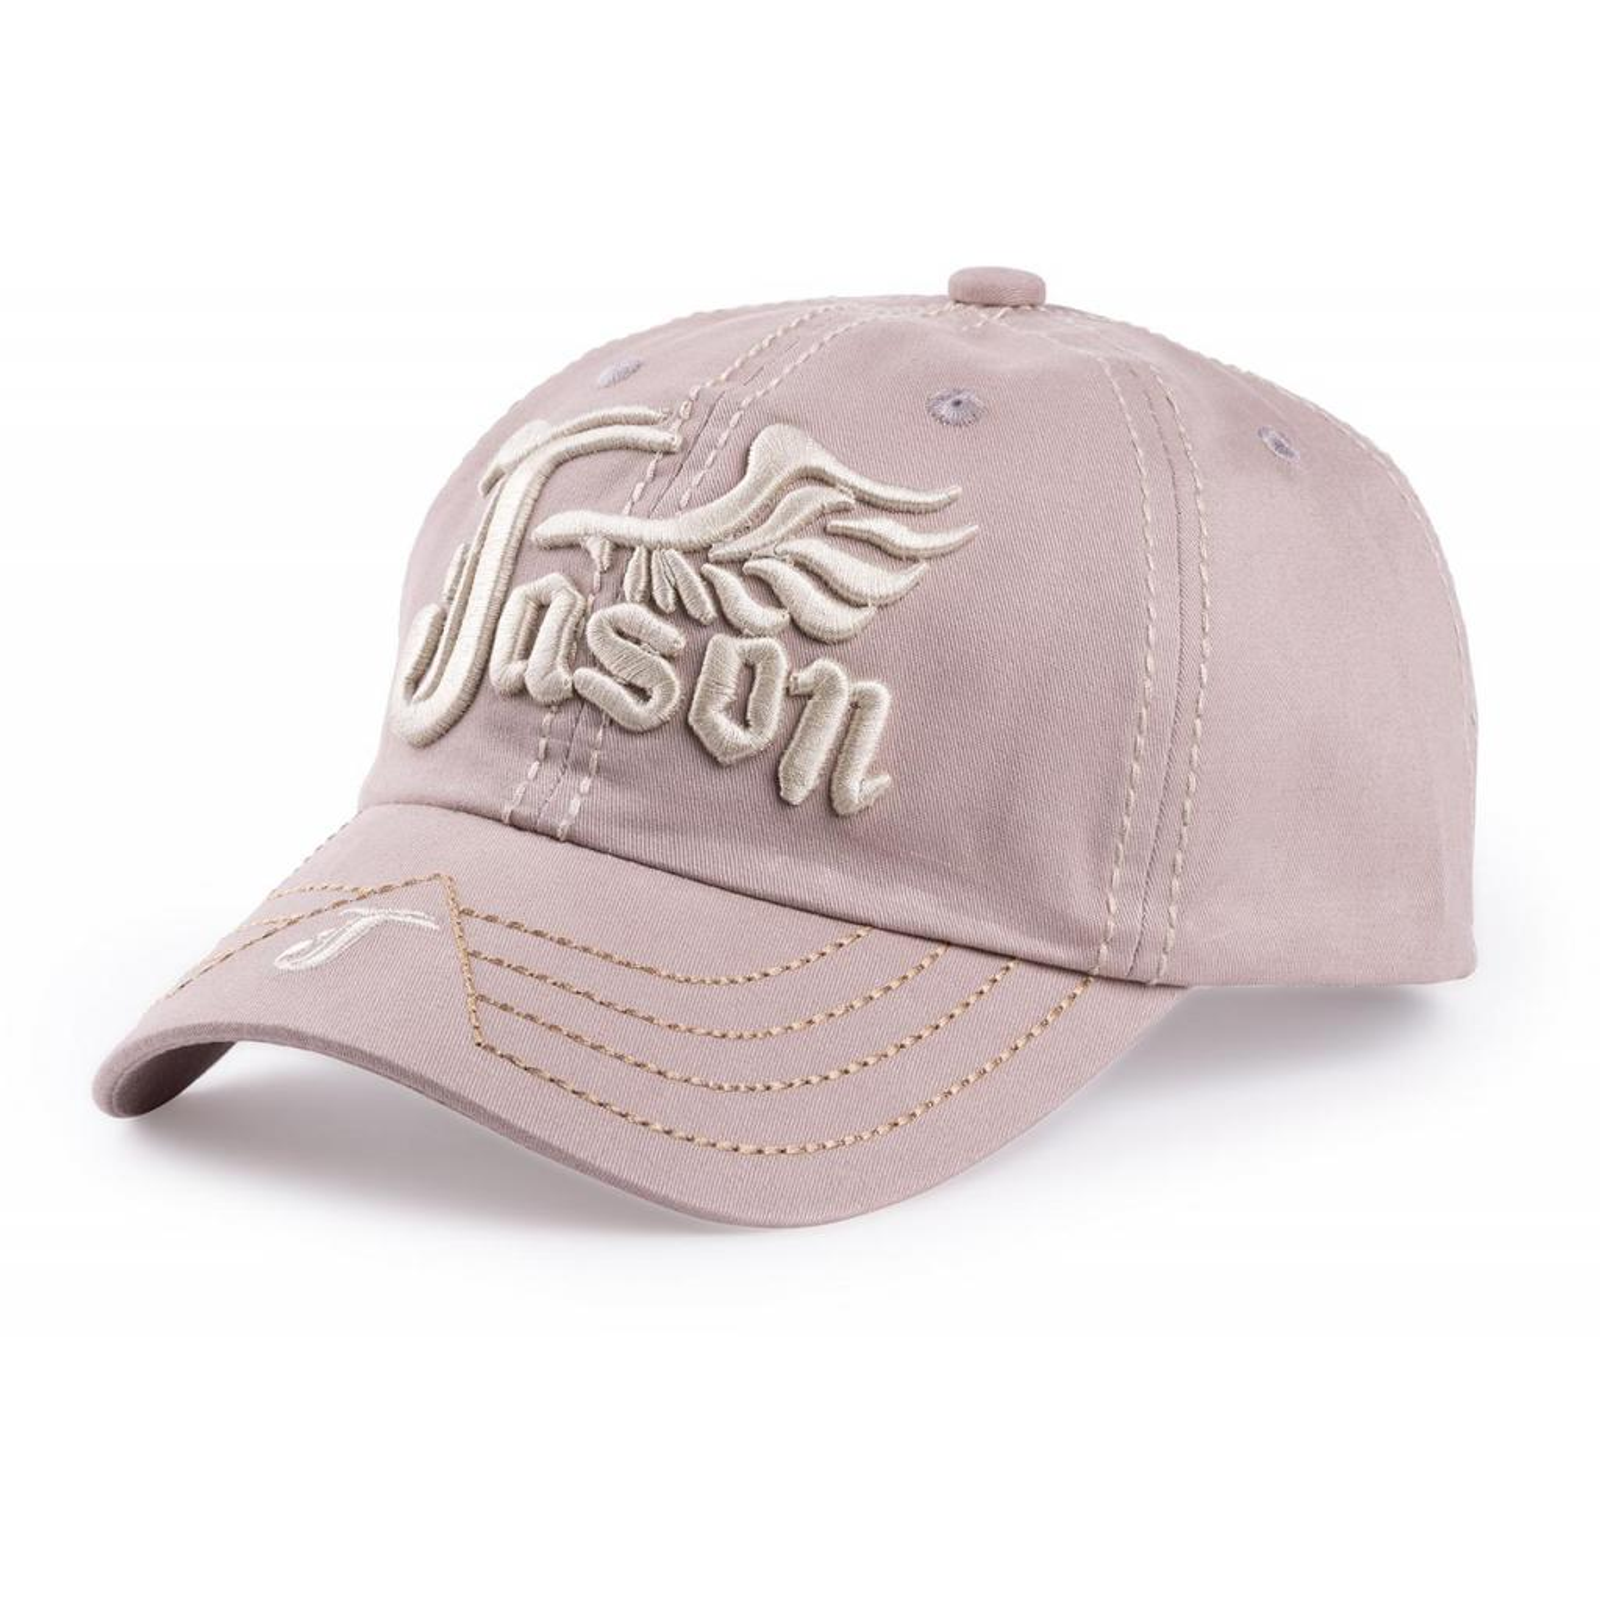 "Кепка Kitti ""JASON"" (Y8320-7-54B-beige)"